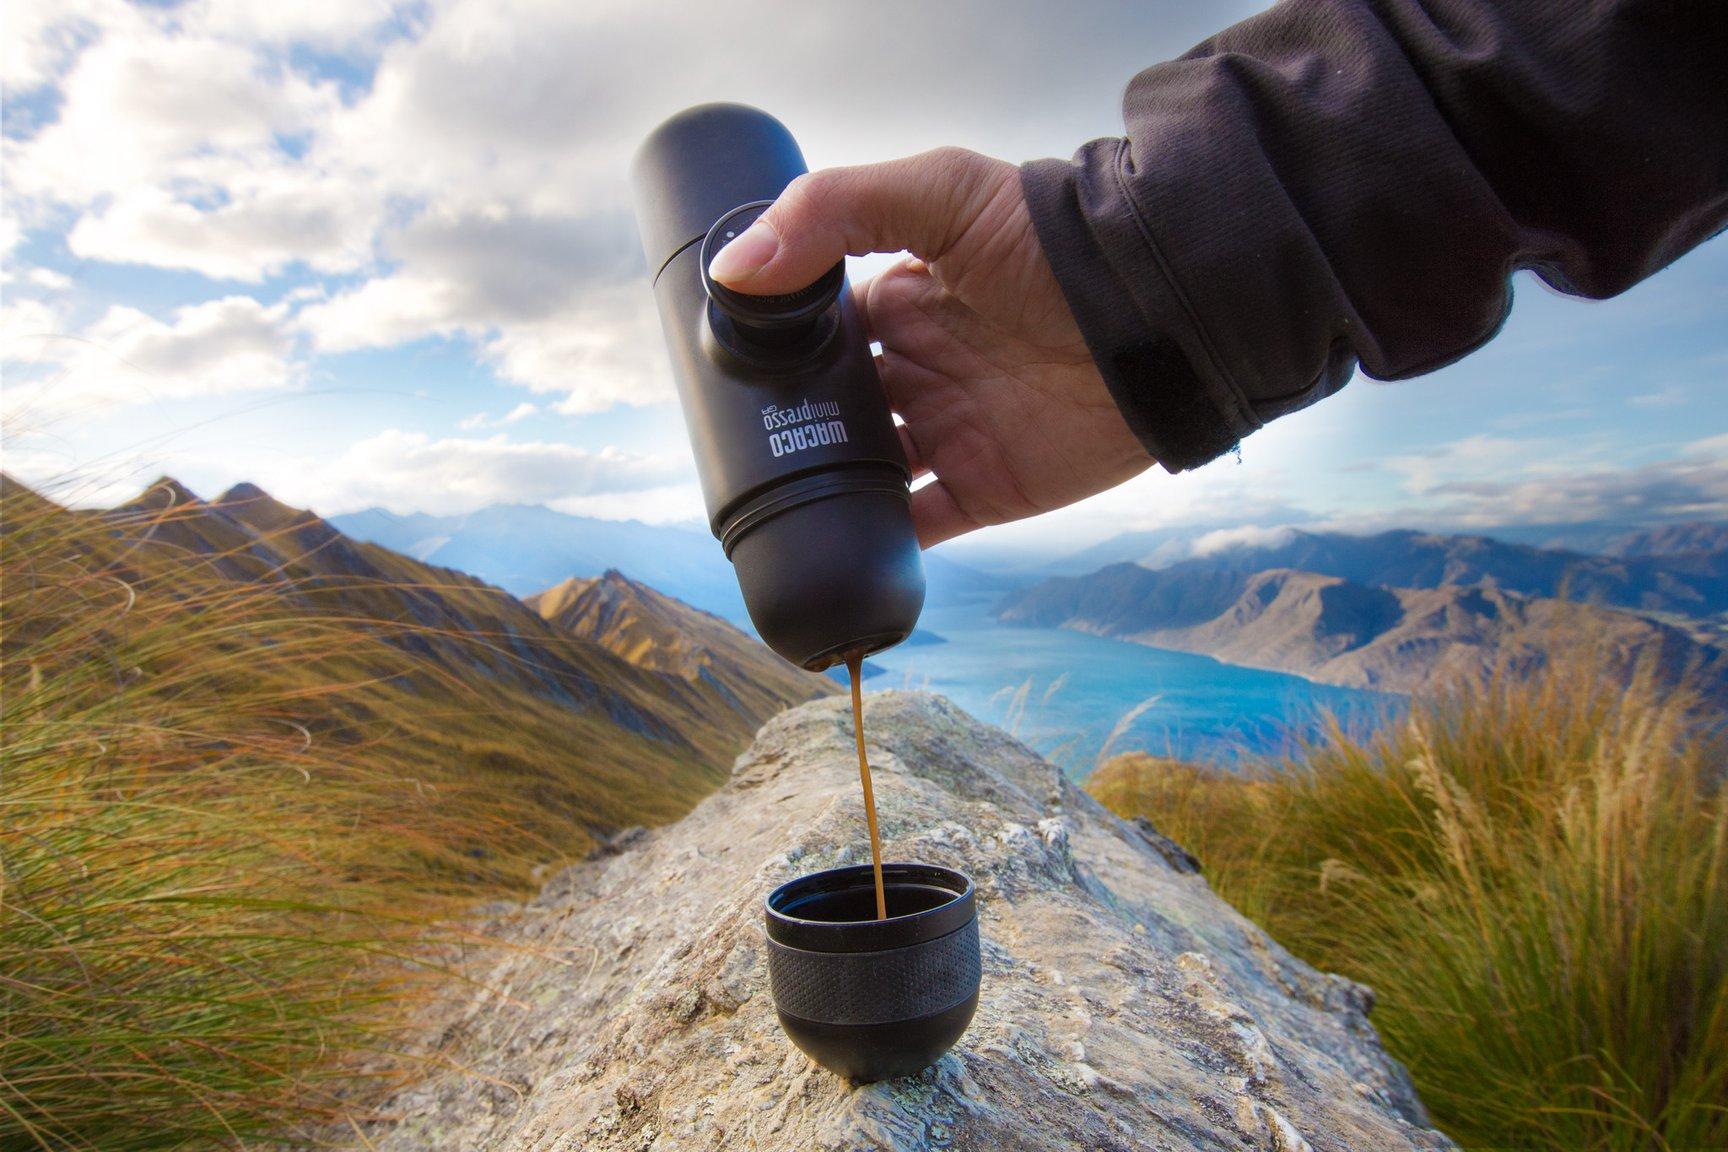 Wacaco Minipresso GR Taşınabilir Kahve Makinesi